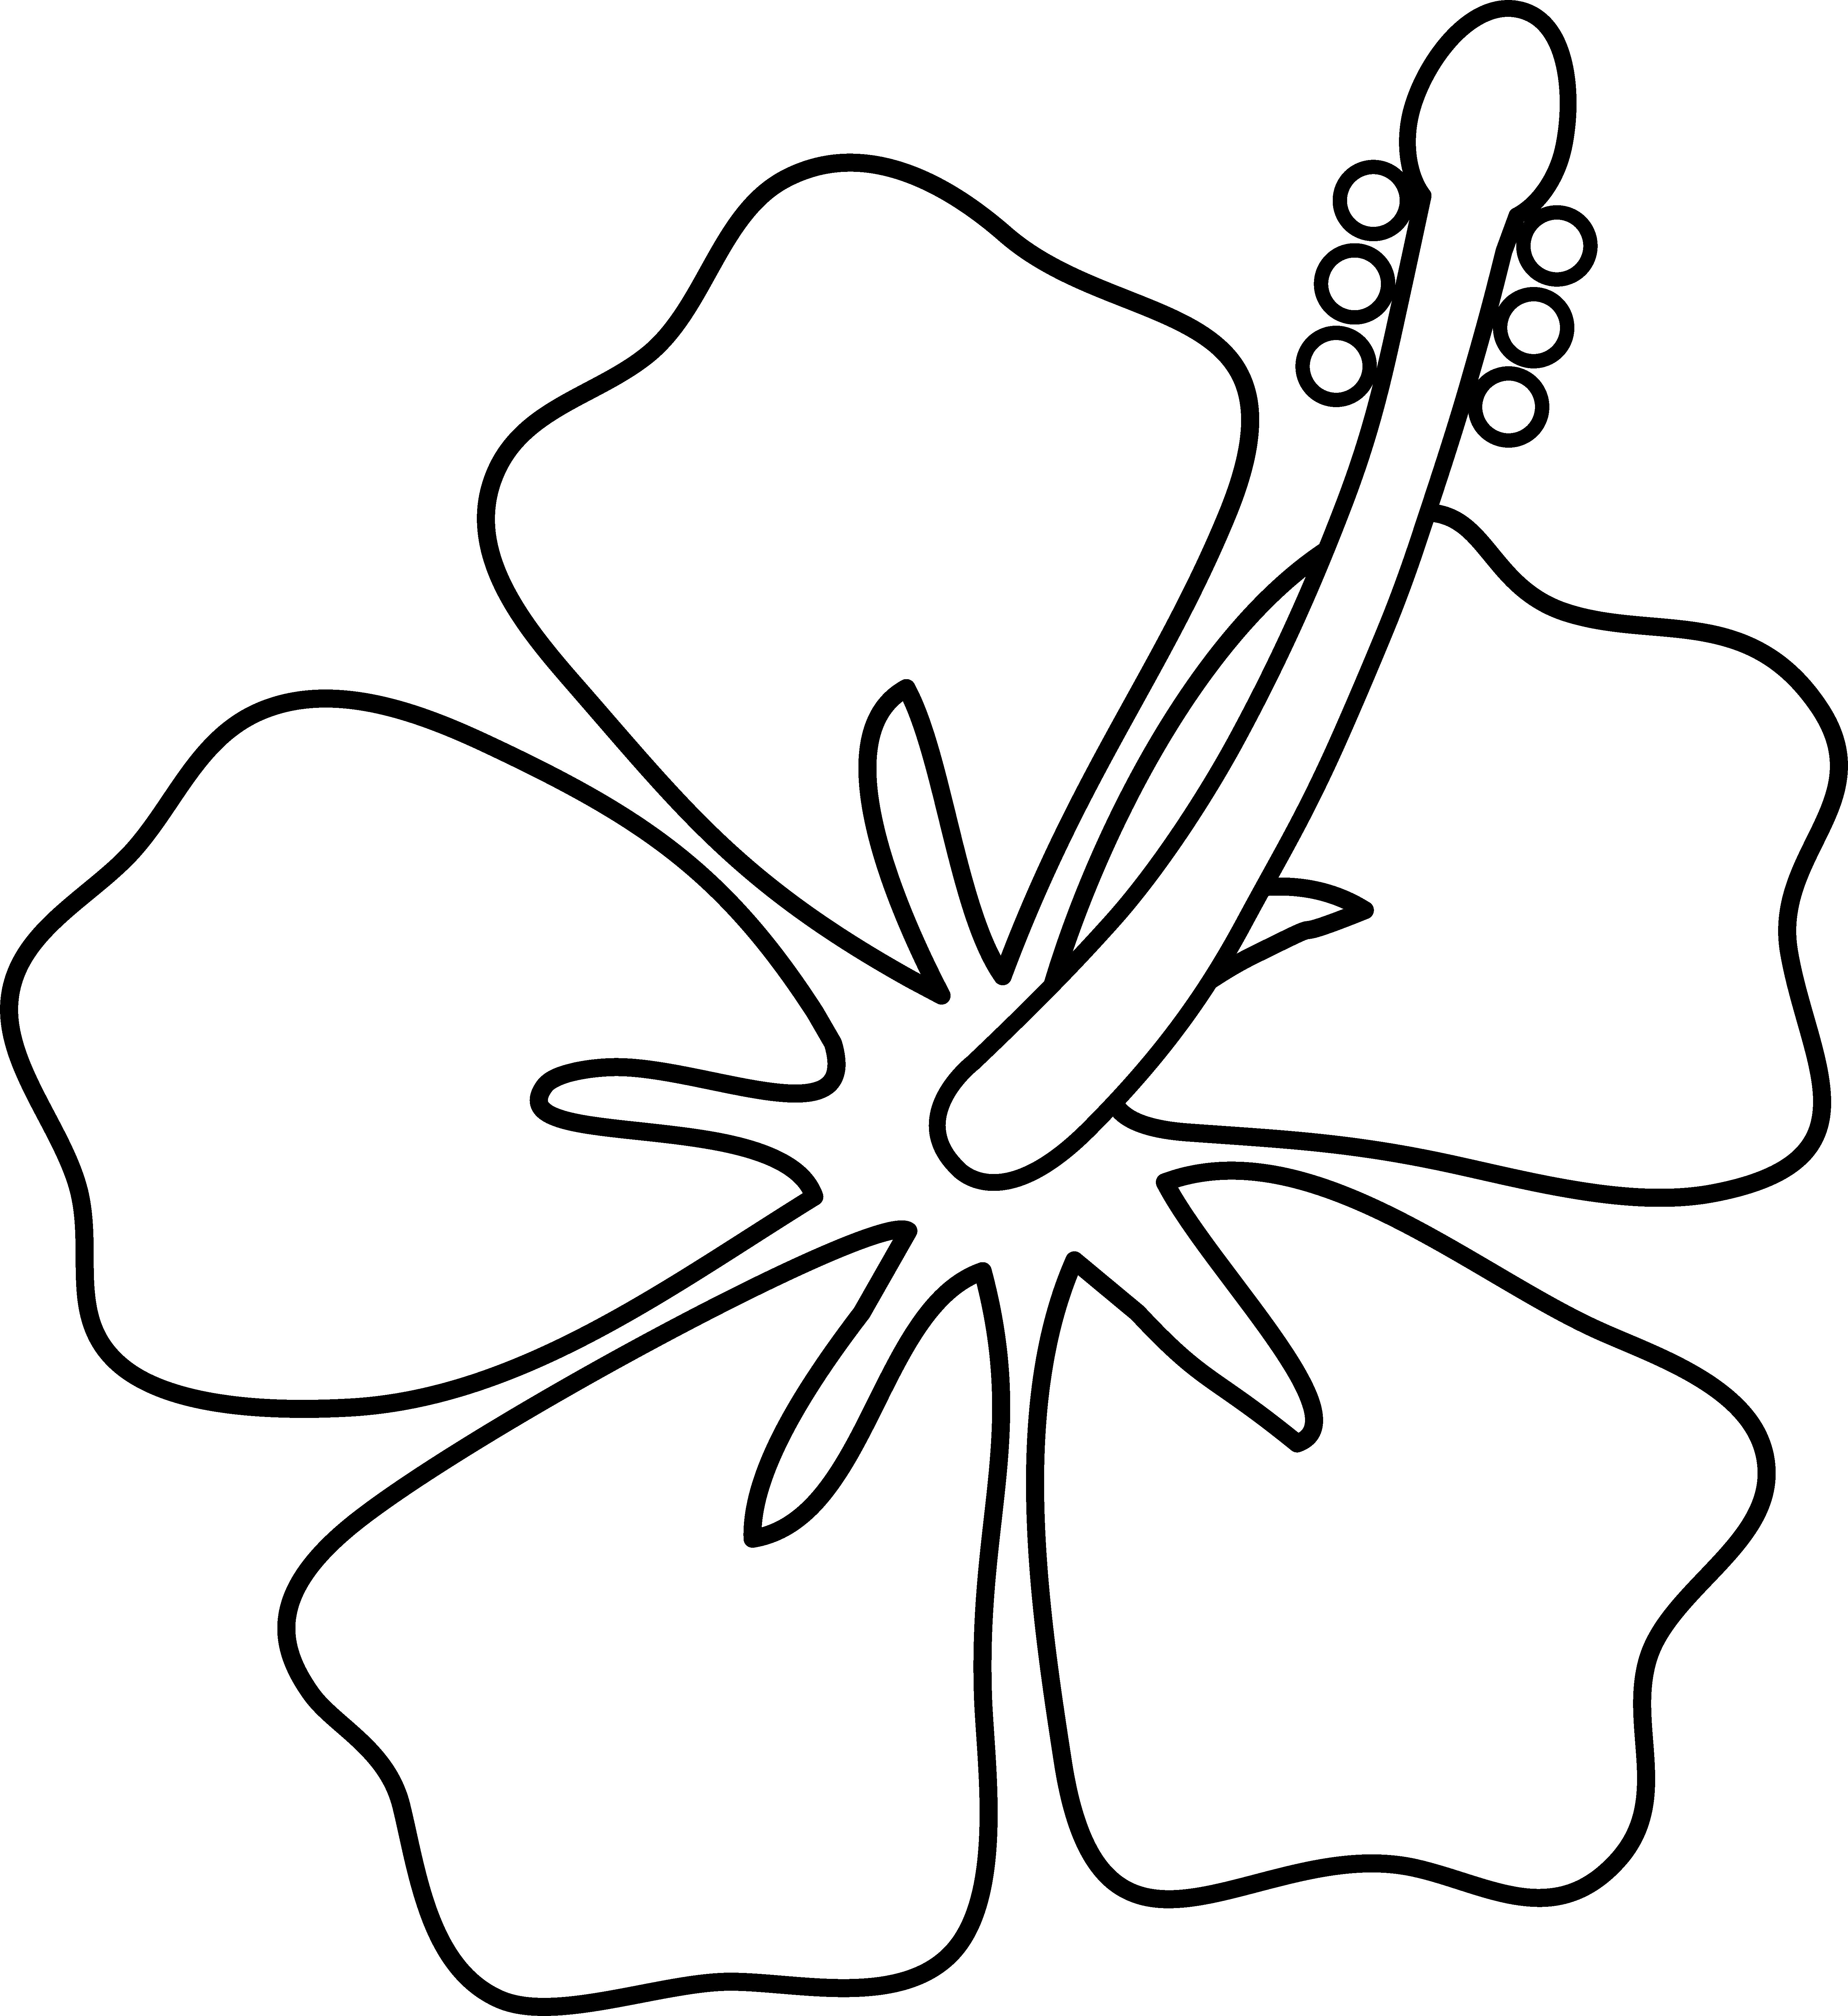 Drawn hibiscus long flower Cartoon on Free Clip